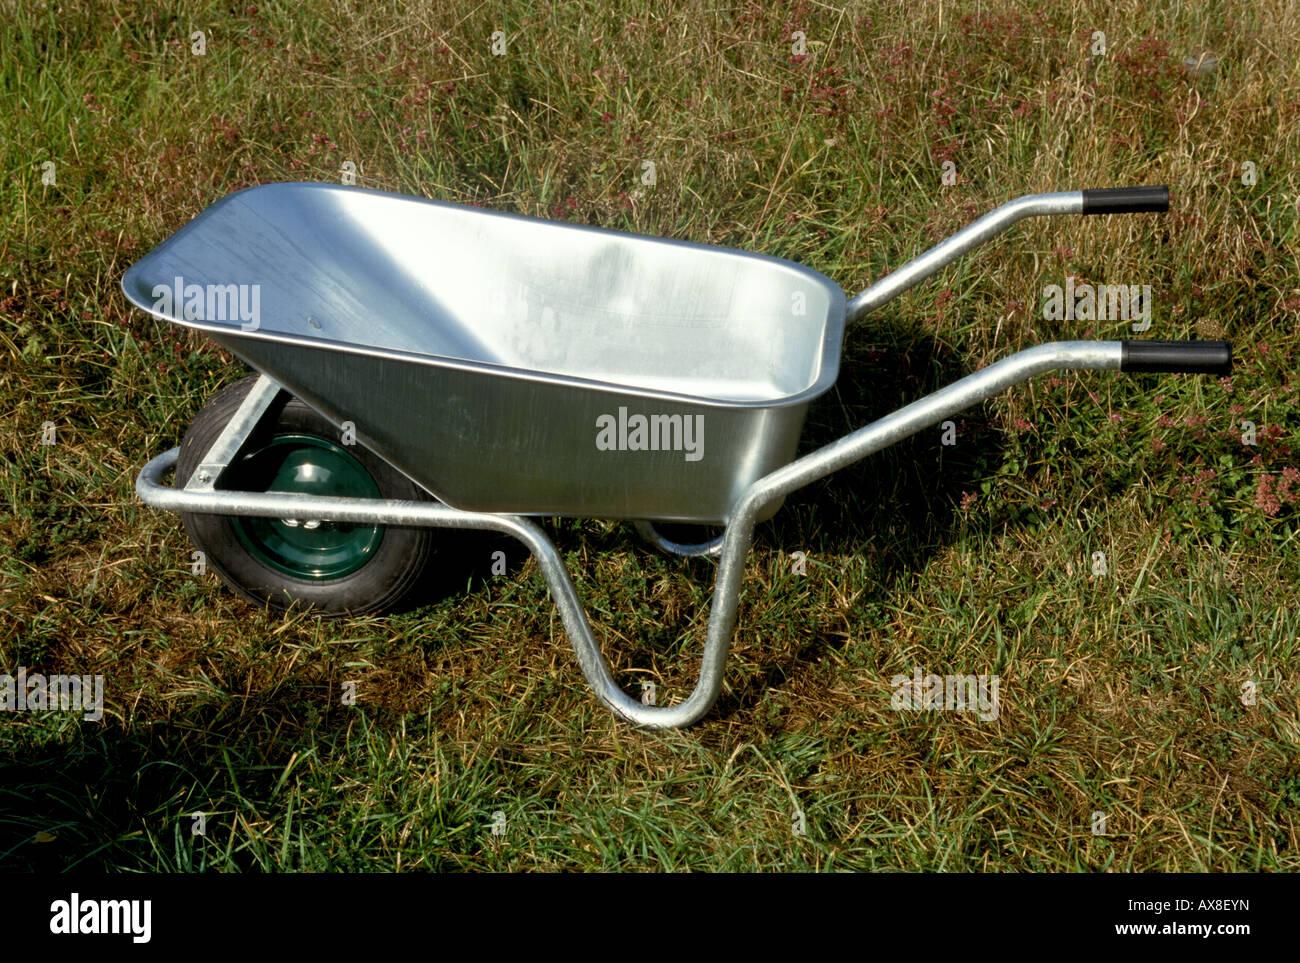 a new galvanized wheelbarrow - Stock Image